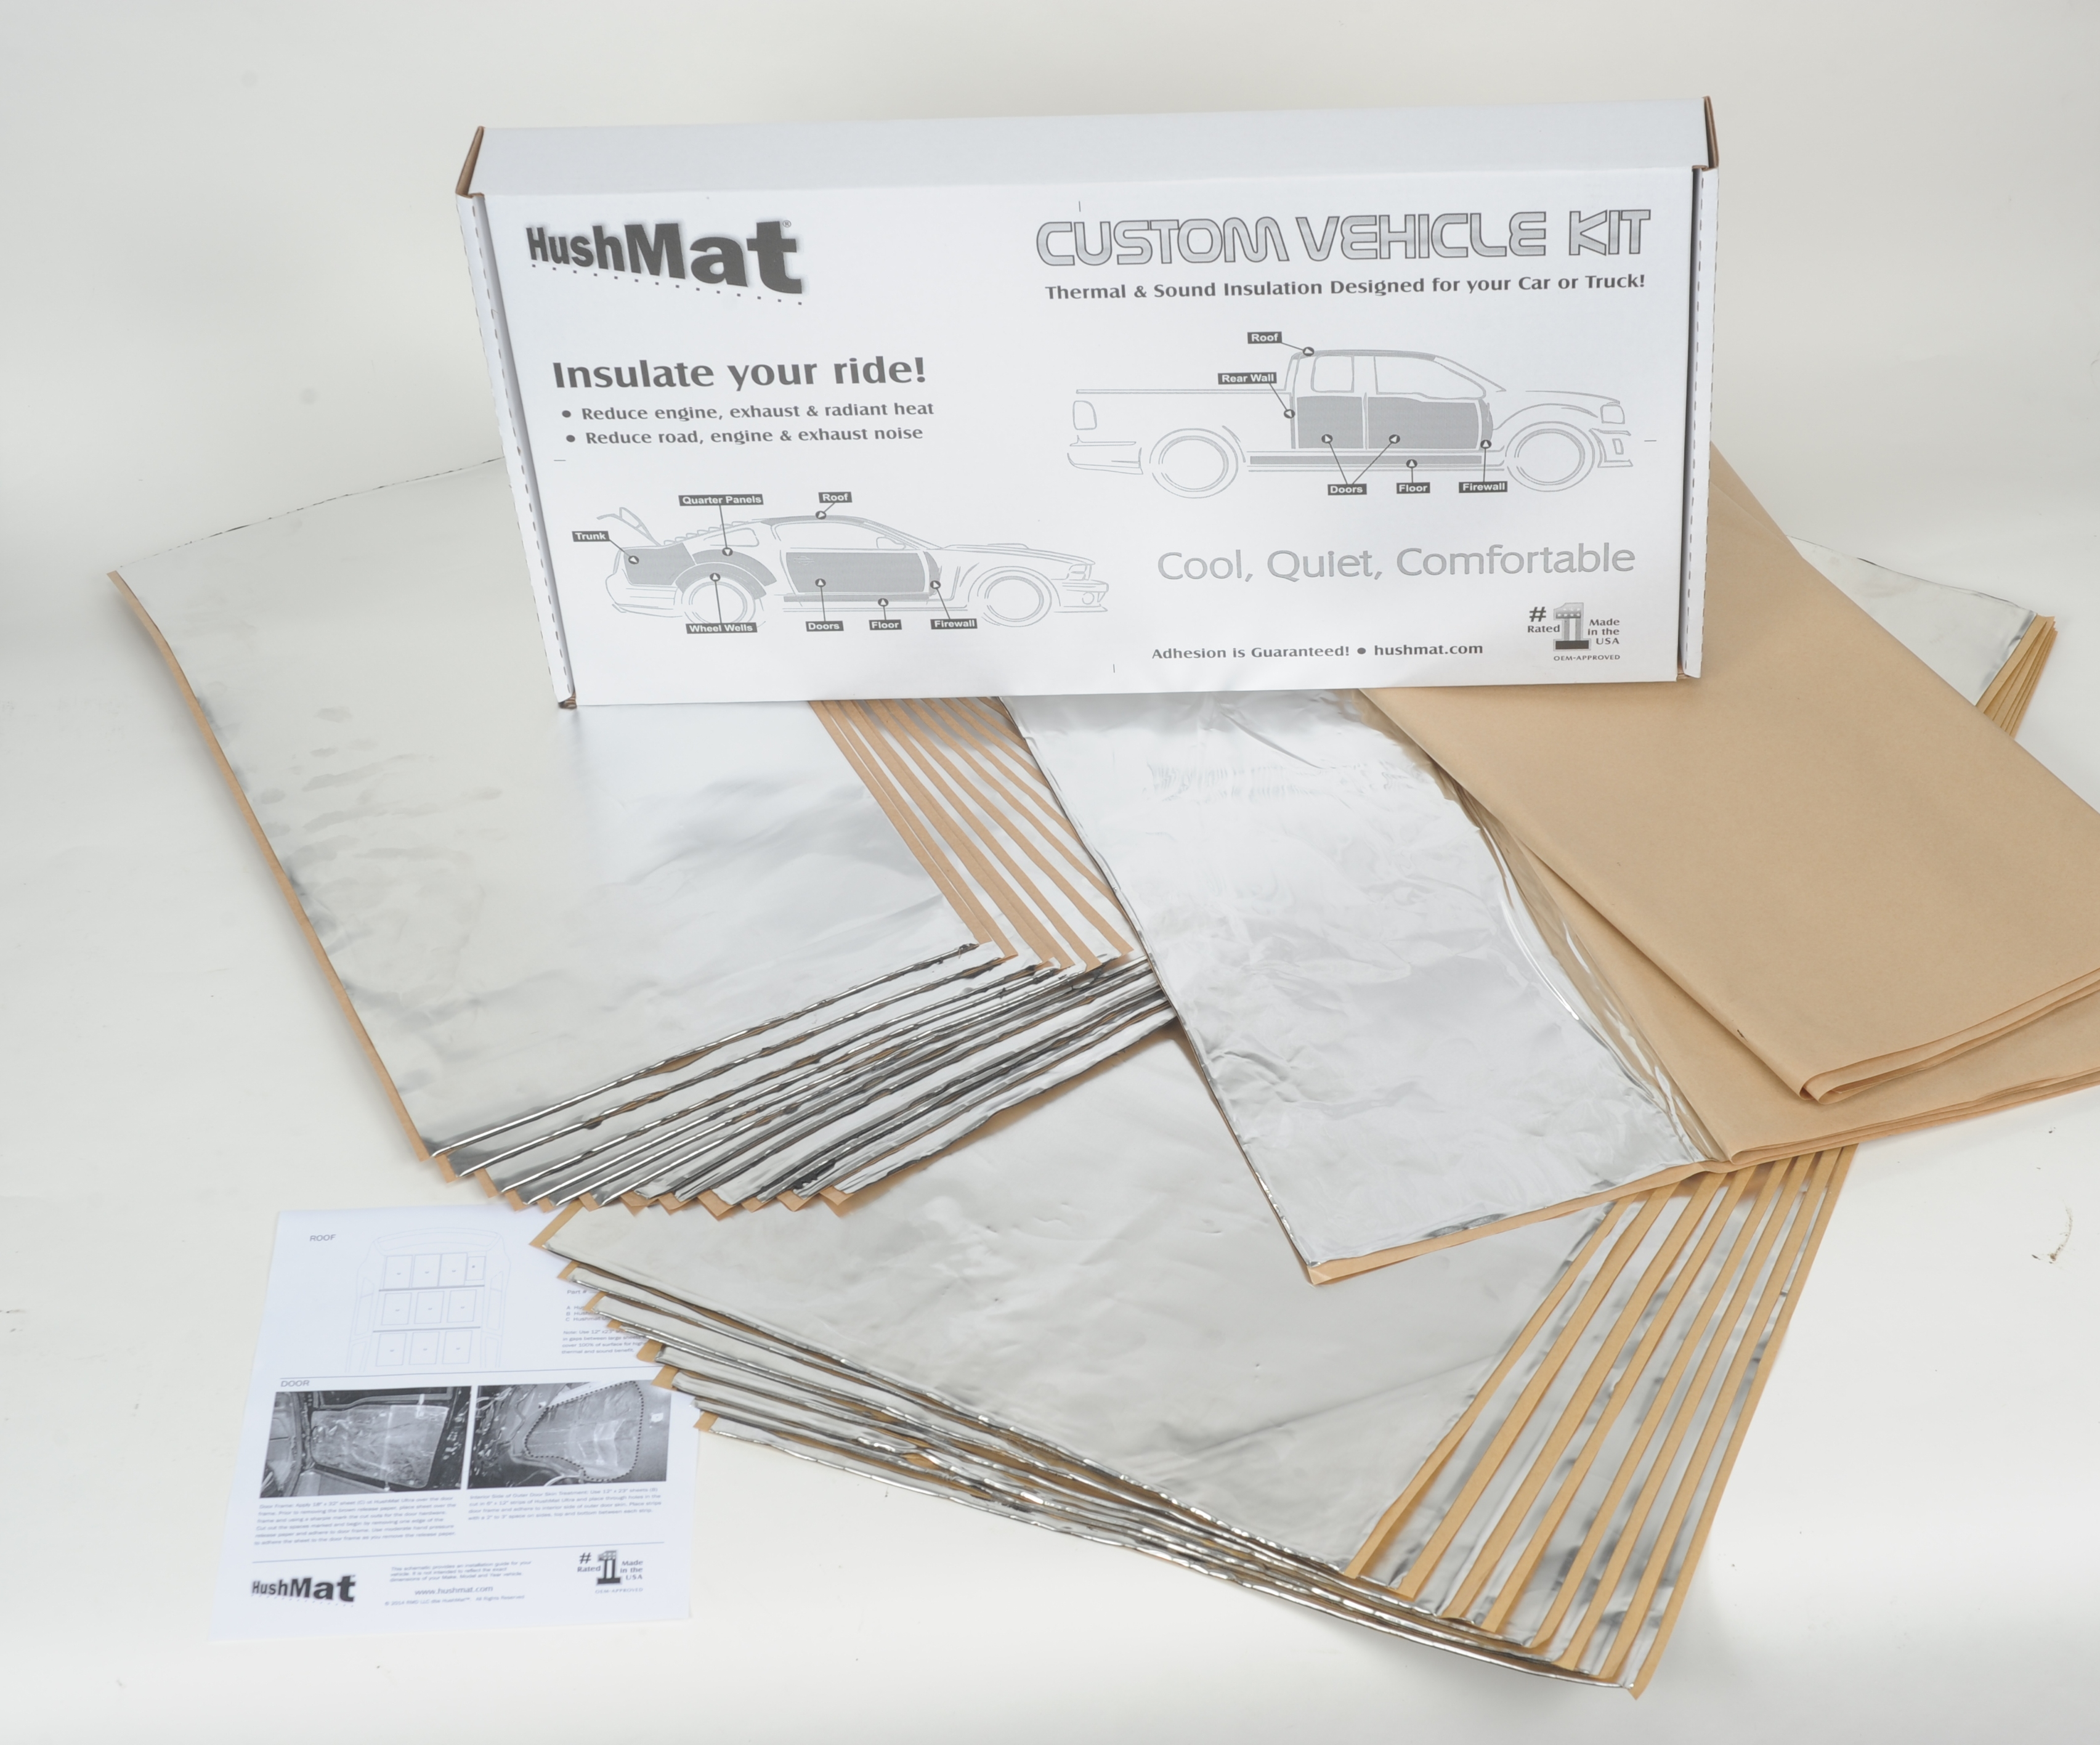 Hushmat 58020 Complete Vehicle Custom Insulation Kit